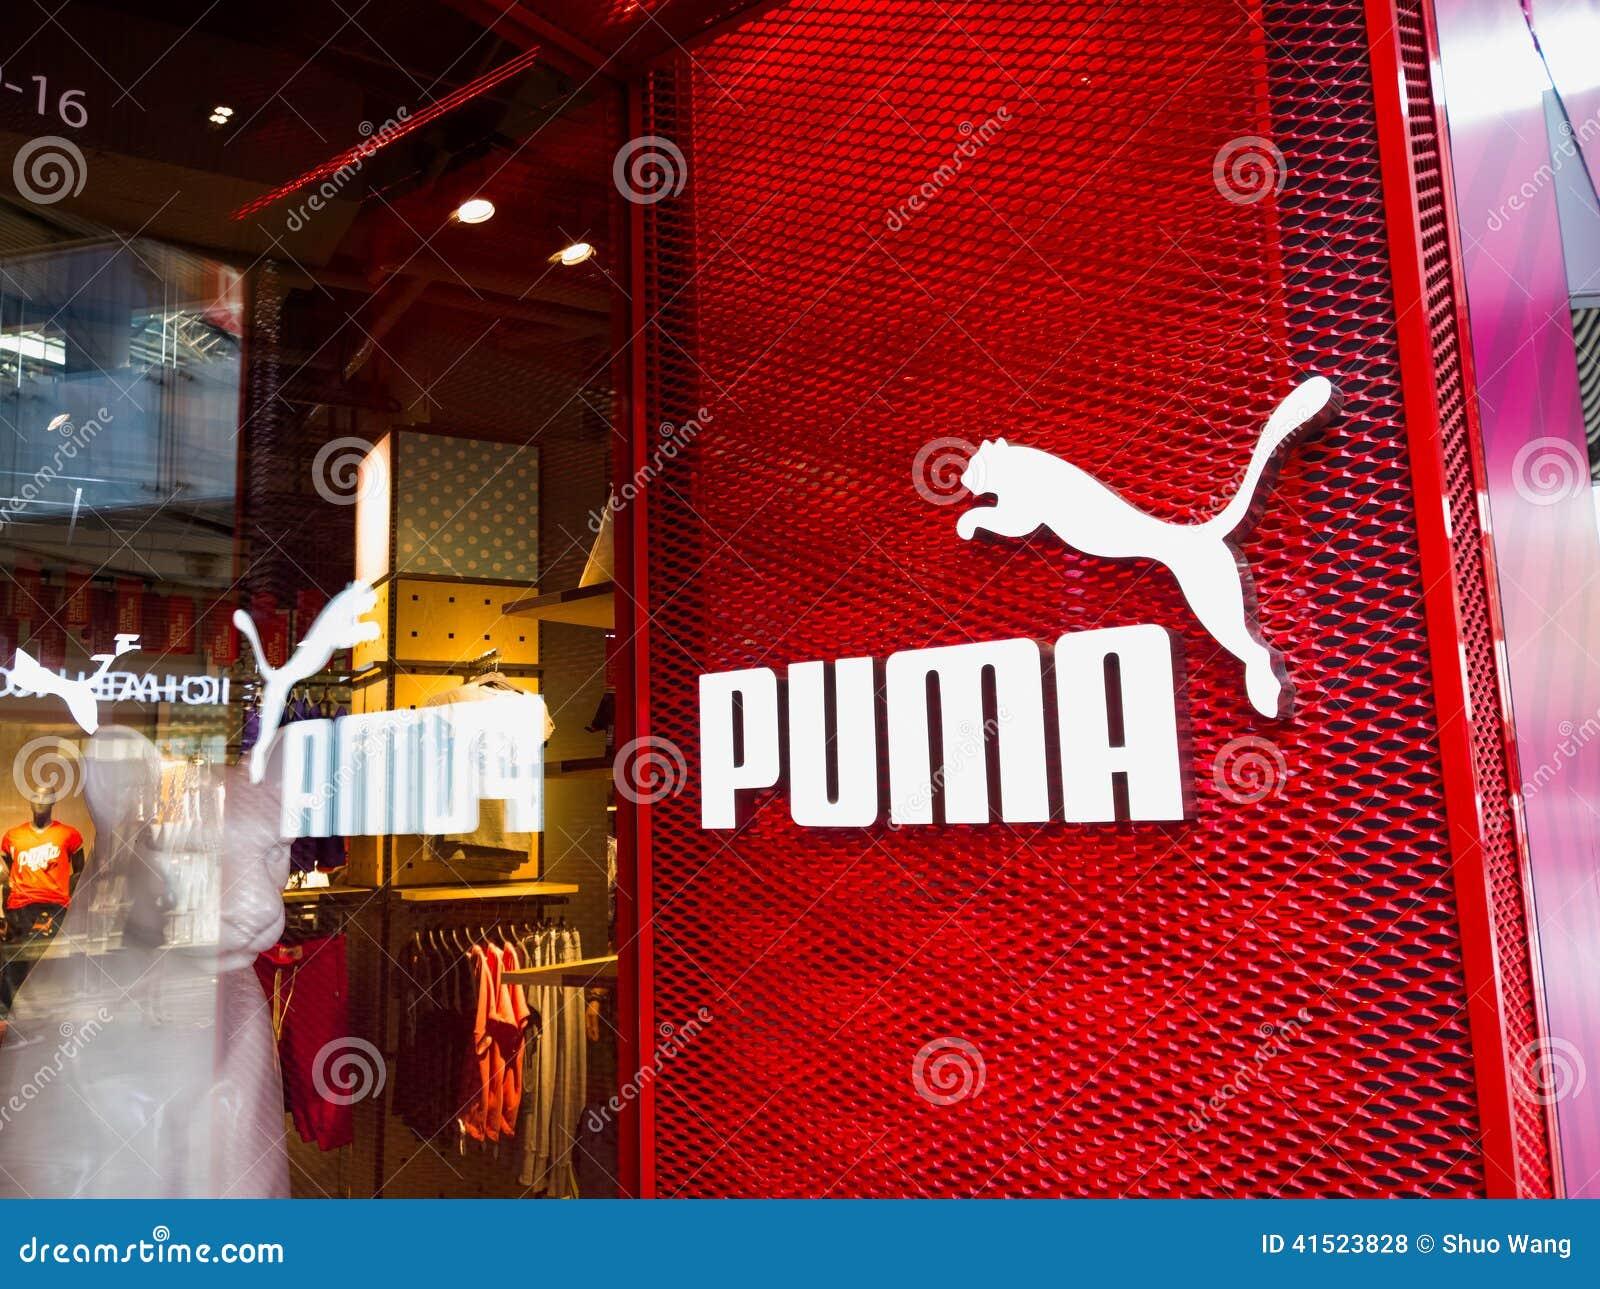 a75e09548e Κατάστημα Puma σε ένα σύγχρονο κτήριο. Οι Σχεδιαστές Επέλεξαν Επίσης αυτές  τις Στοκ Φωτογραφίες